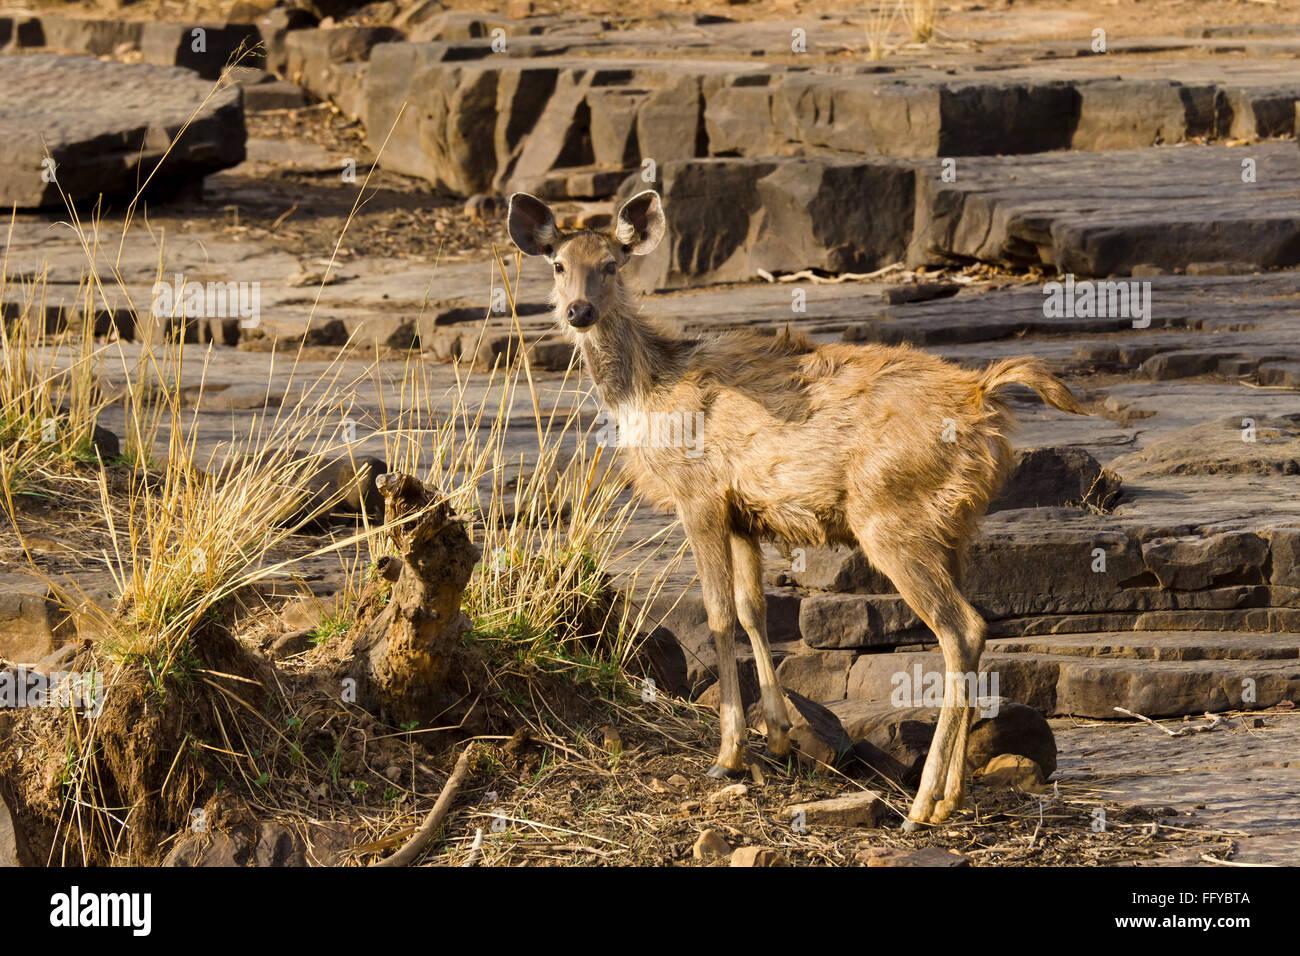 Sambar deer on rocky terrain of Panna National Park madhya pradesh India - Stock Image